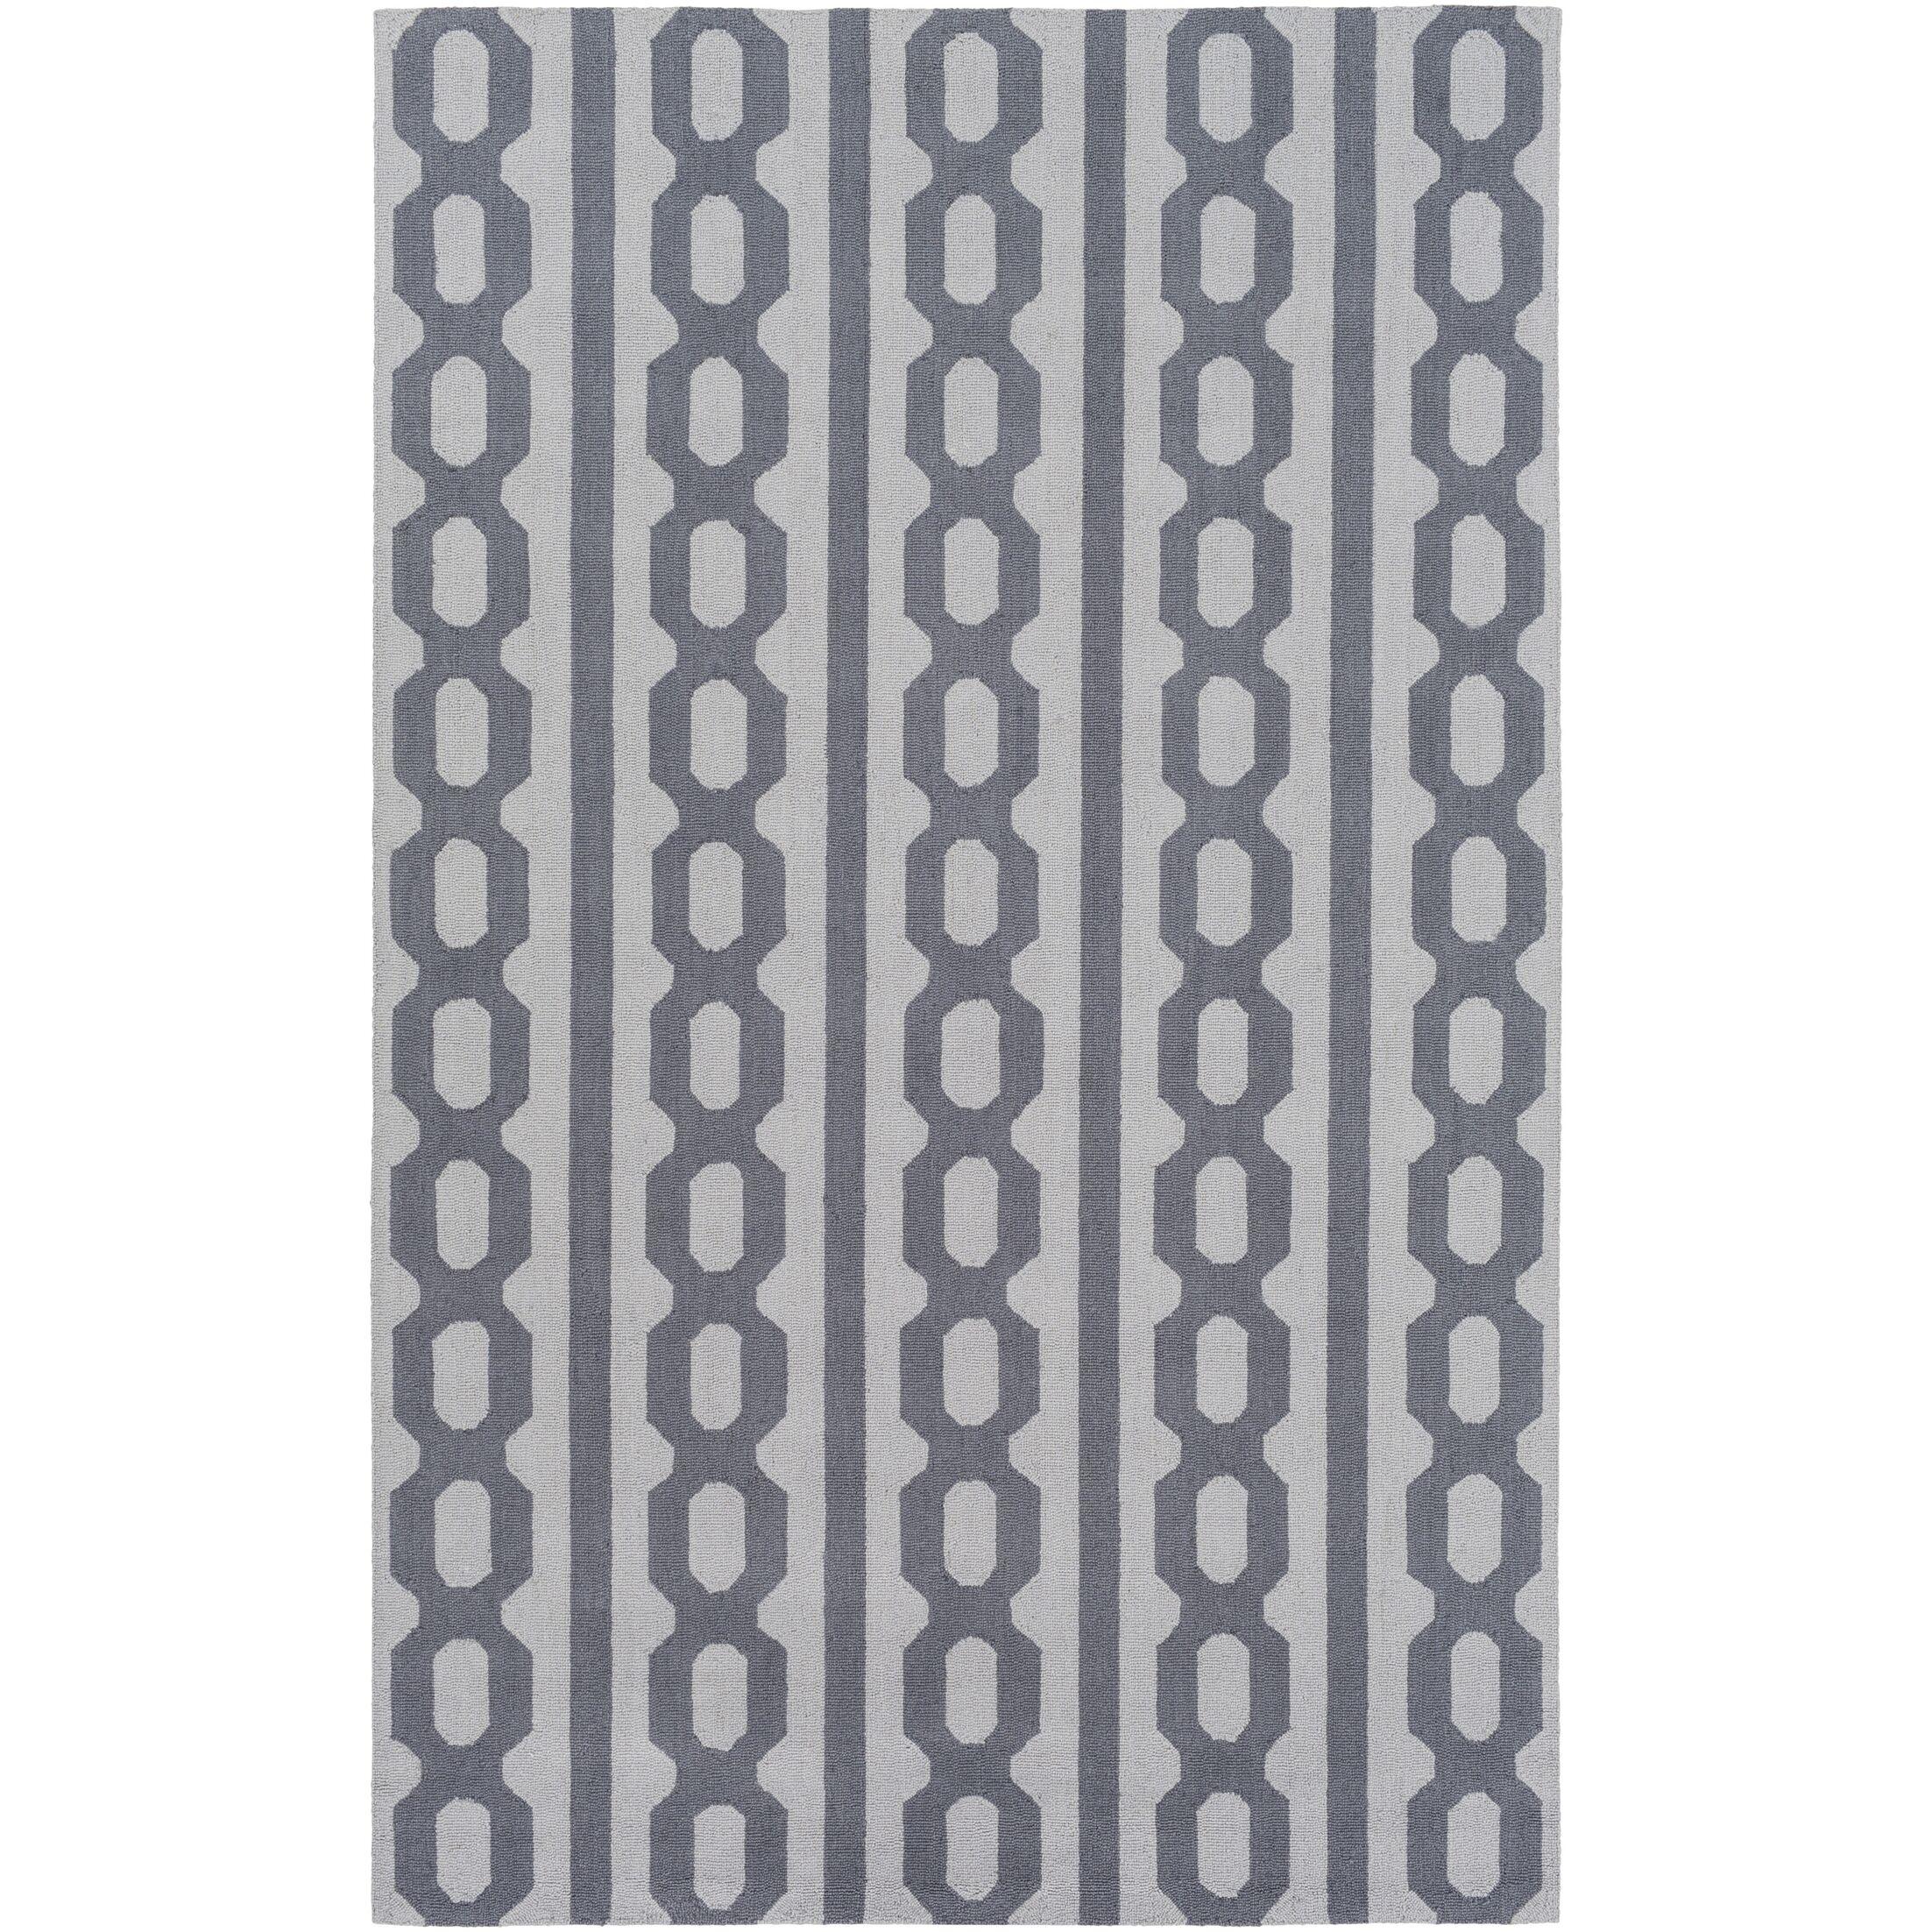 Herring Hand-Hooked Navy/Light Gray Area Rug Rug Size: Rectangle 4' x 6'